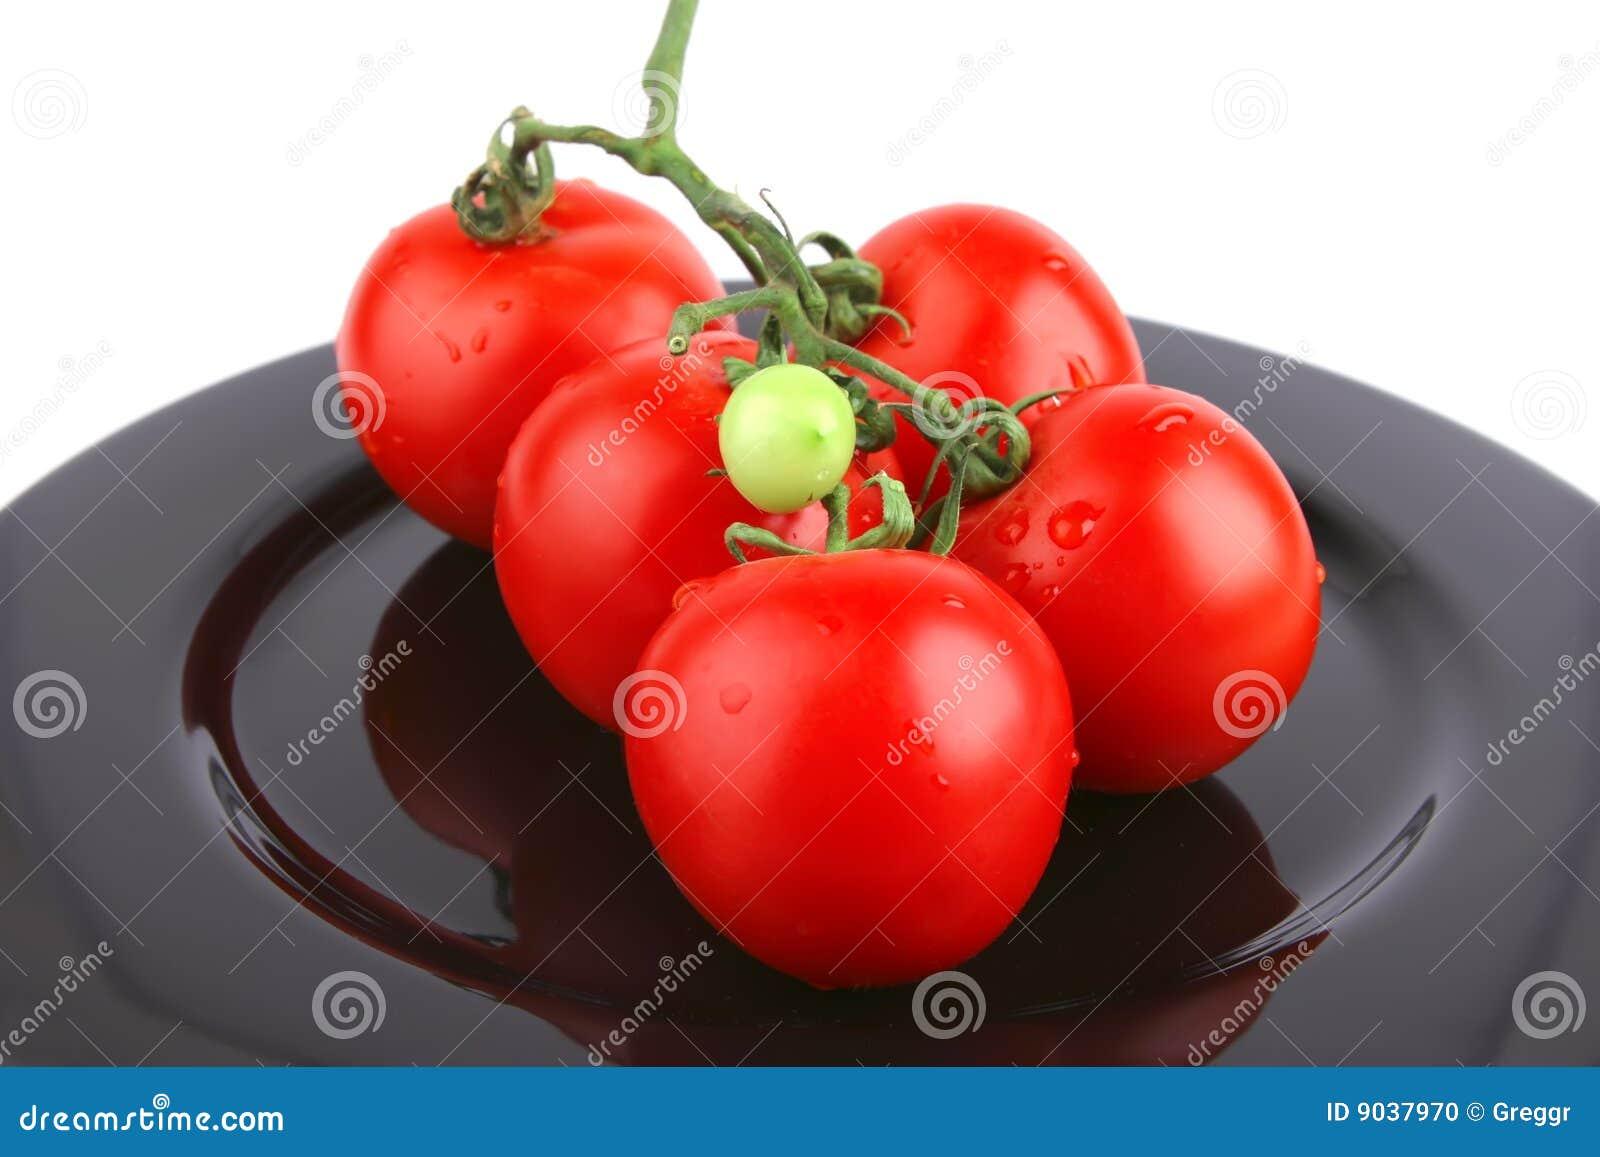 Tomato On Black Stock Photo - Image: 9037970